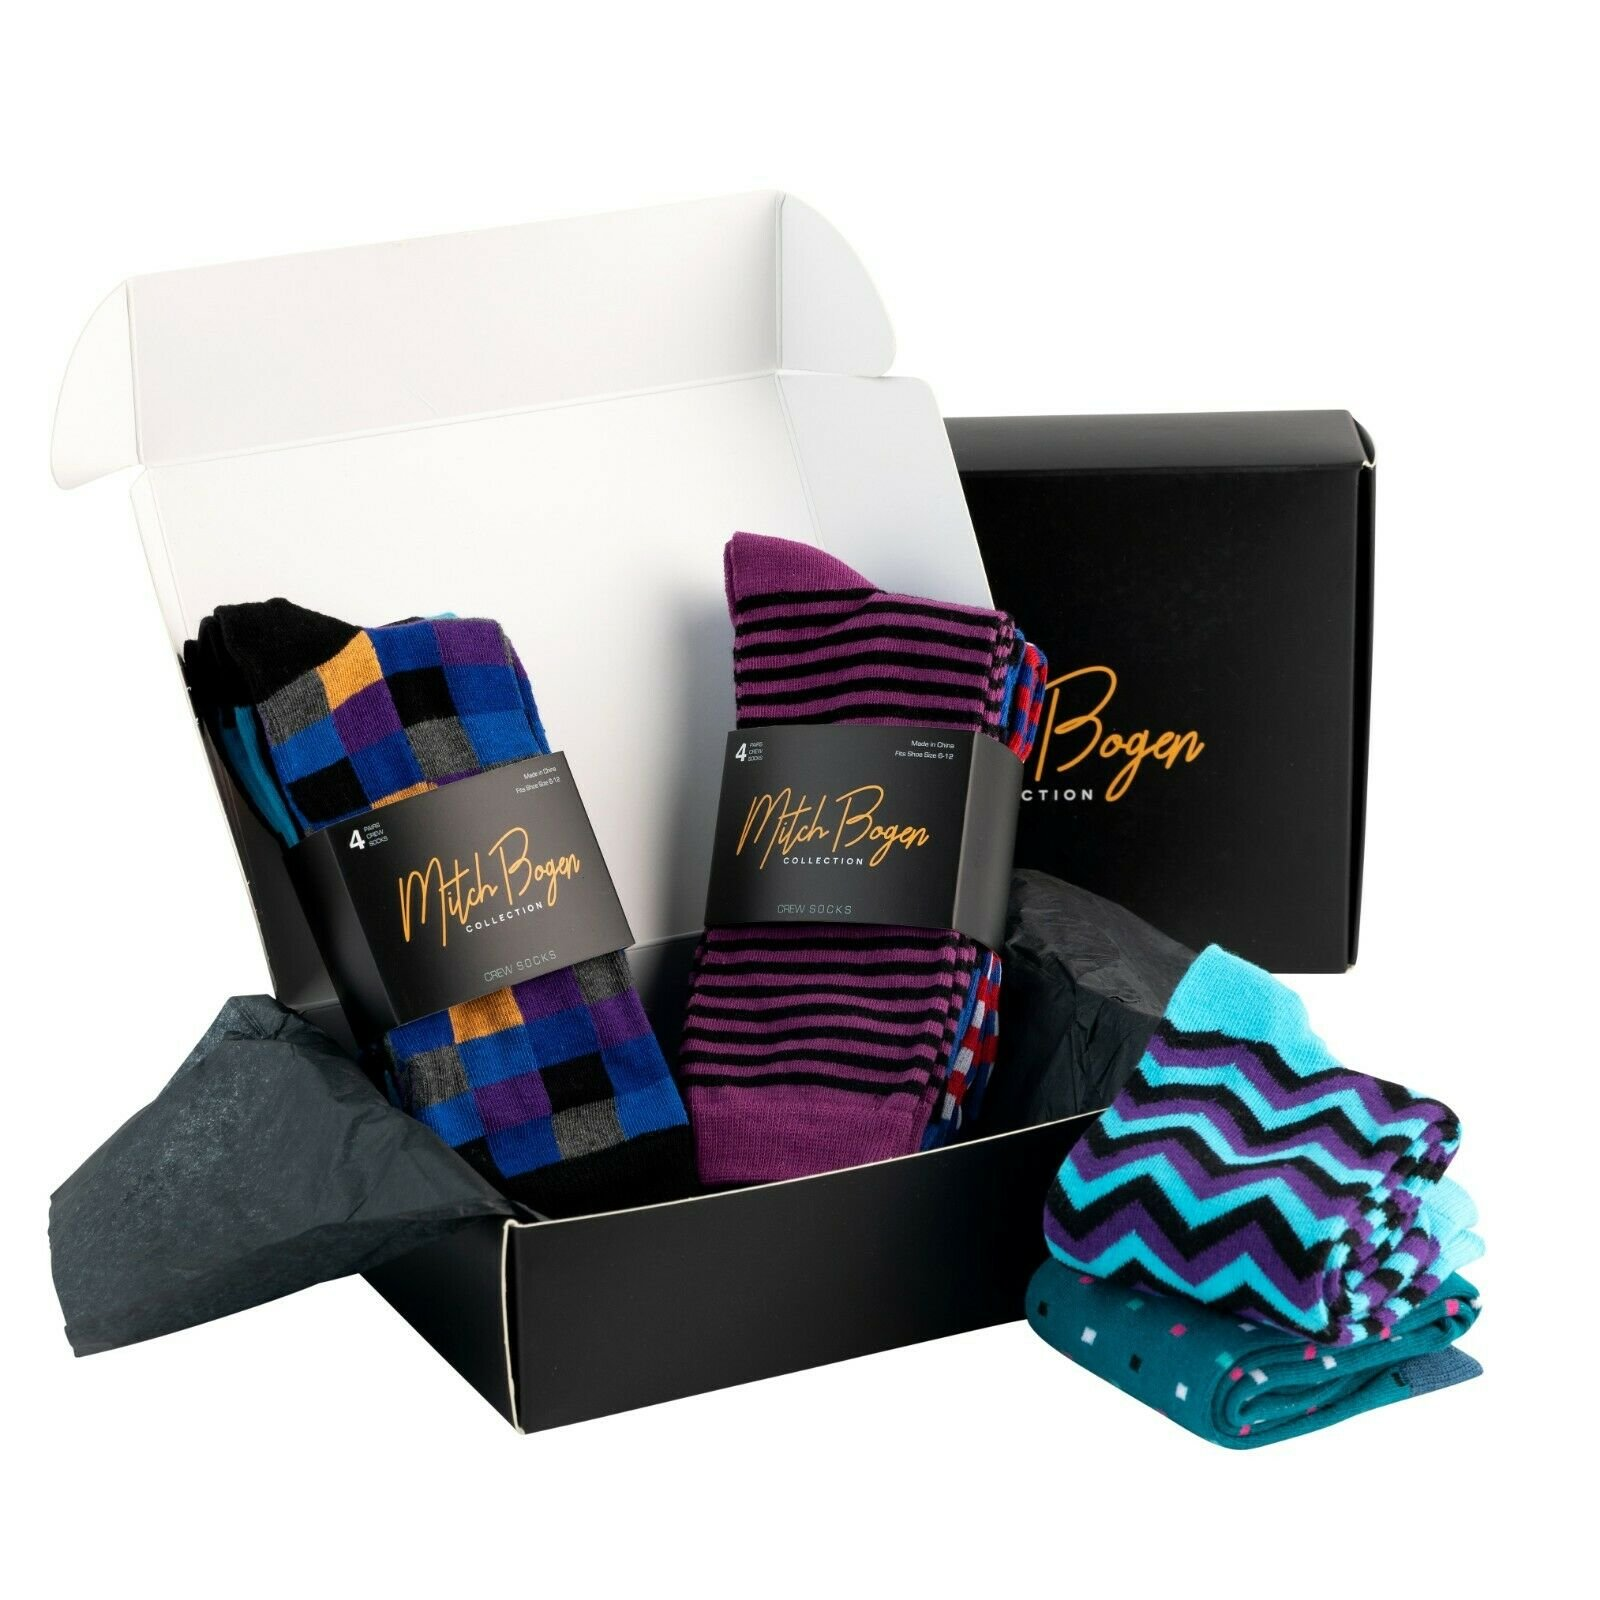 Mitch-Bogen-Mens-Cotton-Dress-Socks-Colorful-Fashion-Crew-Socks-8-Pack-Gift-Box thumbnail 28